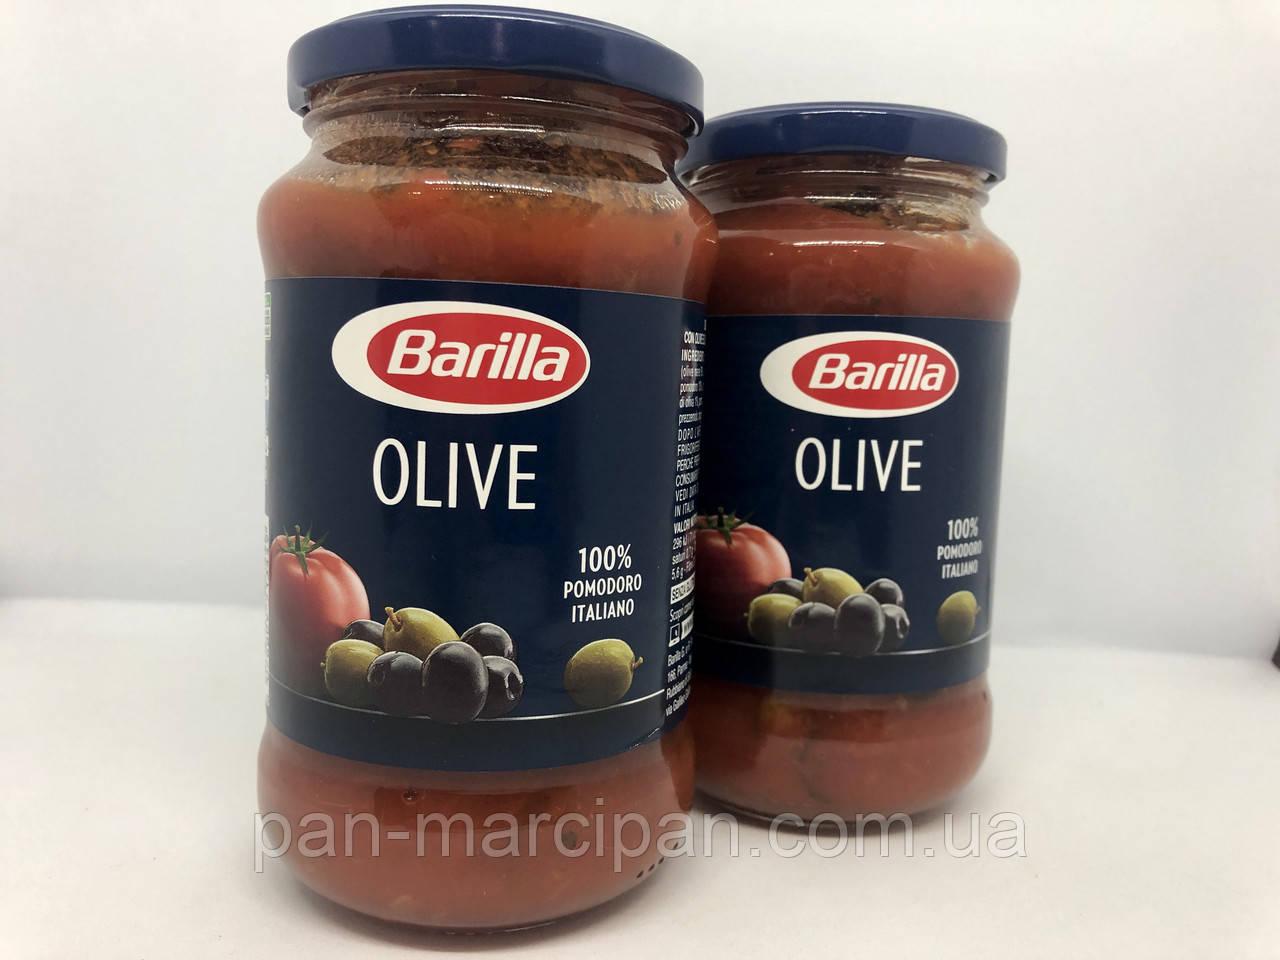 Соус Barilla Olive Італія 400г